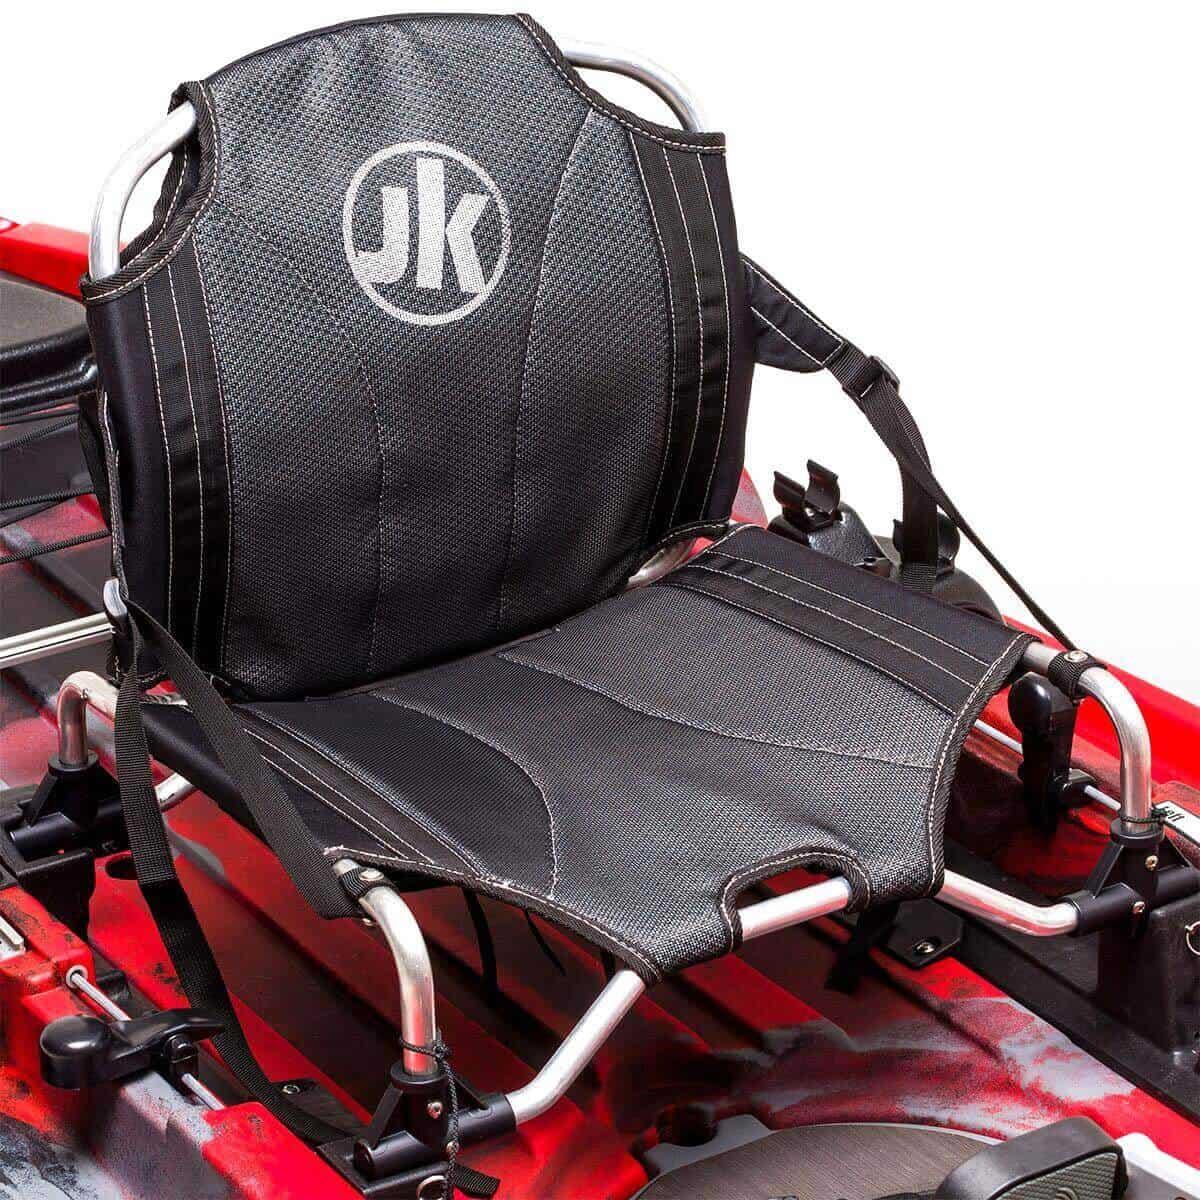 Jackson Kayak Adjustable Hi-Lo Ergonomic Seat with MOLLE System on the Big Rig FD fishing kayak.